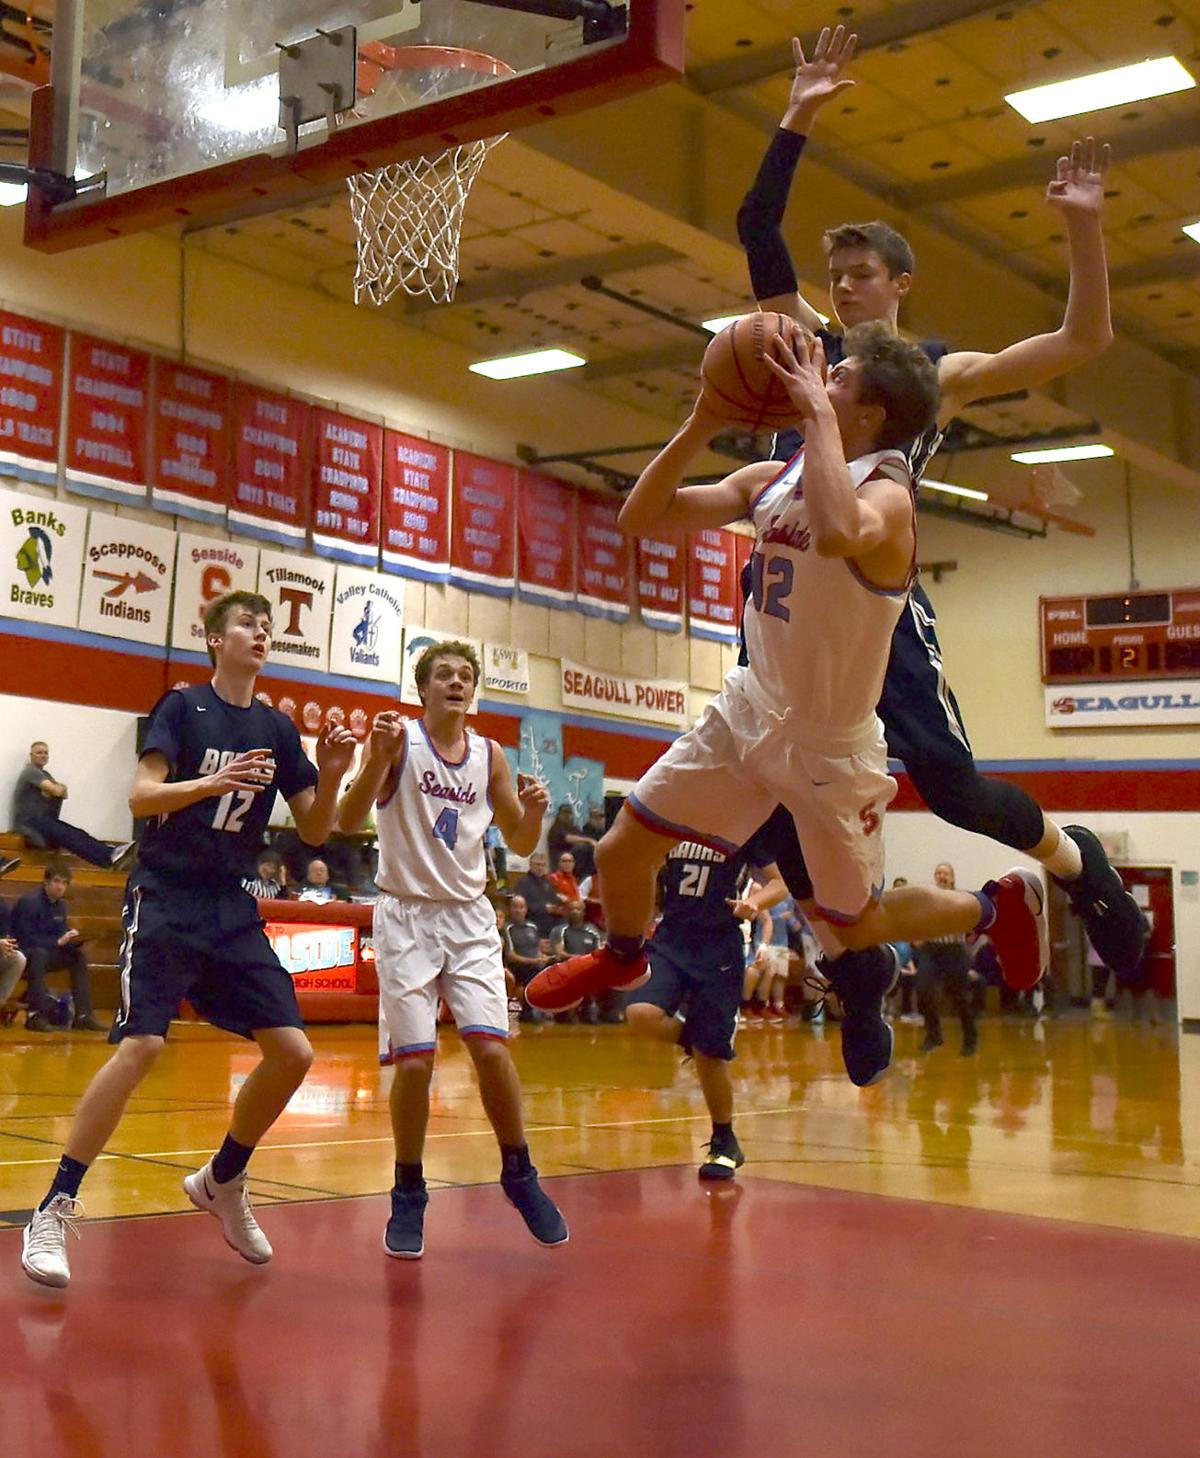 Boys basketball: The Gulls put on a show, as Seaside beats No. 1 Banks